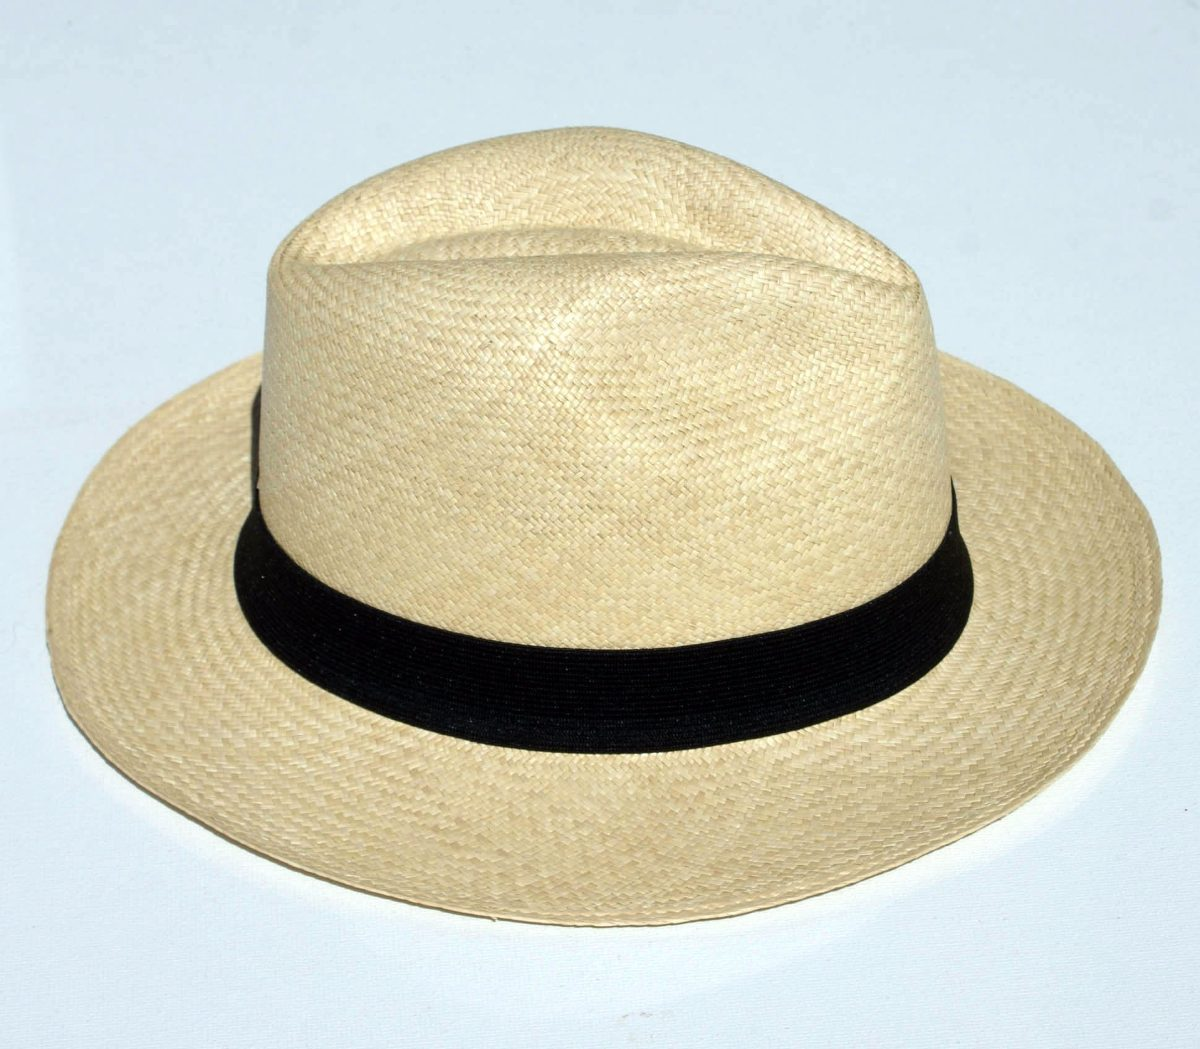 79303689b6452 Sombrero De Paja Toquilla (ecuador) Aguacate Ala Corta - Bs. 1